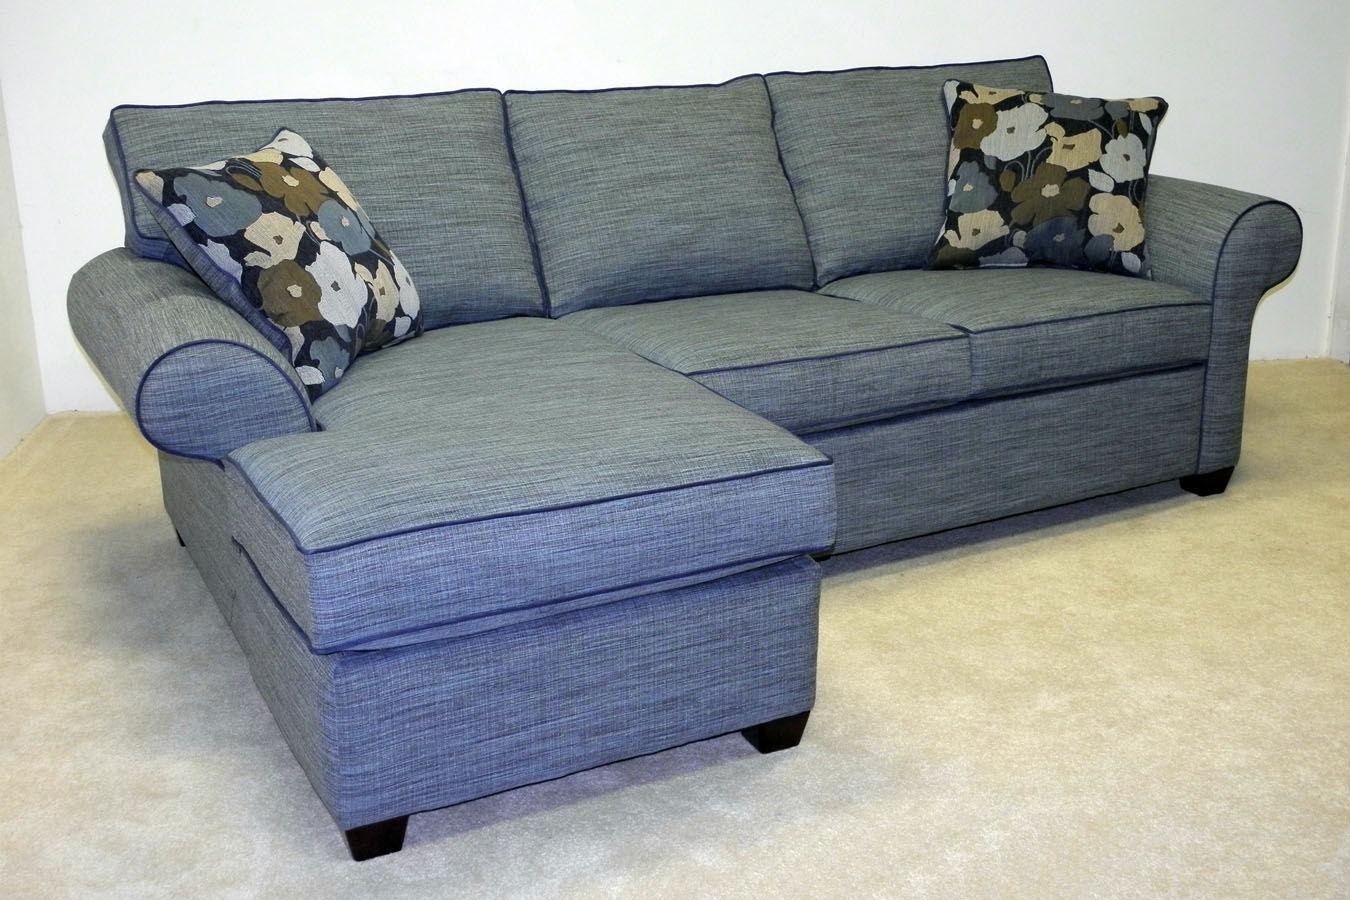 LaCrosse Living Room 91u0026#39;u0026#39; RAF No Sag Sofa with Left Corner 8350LC - High Country Furniture ...